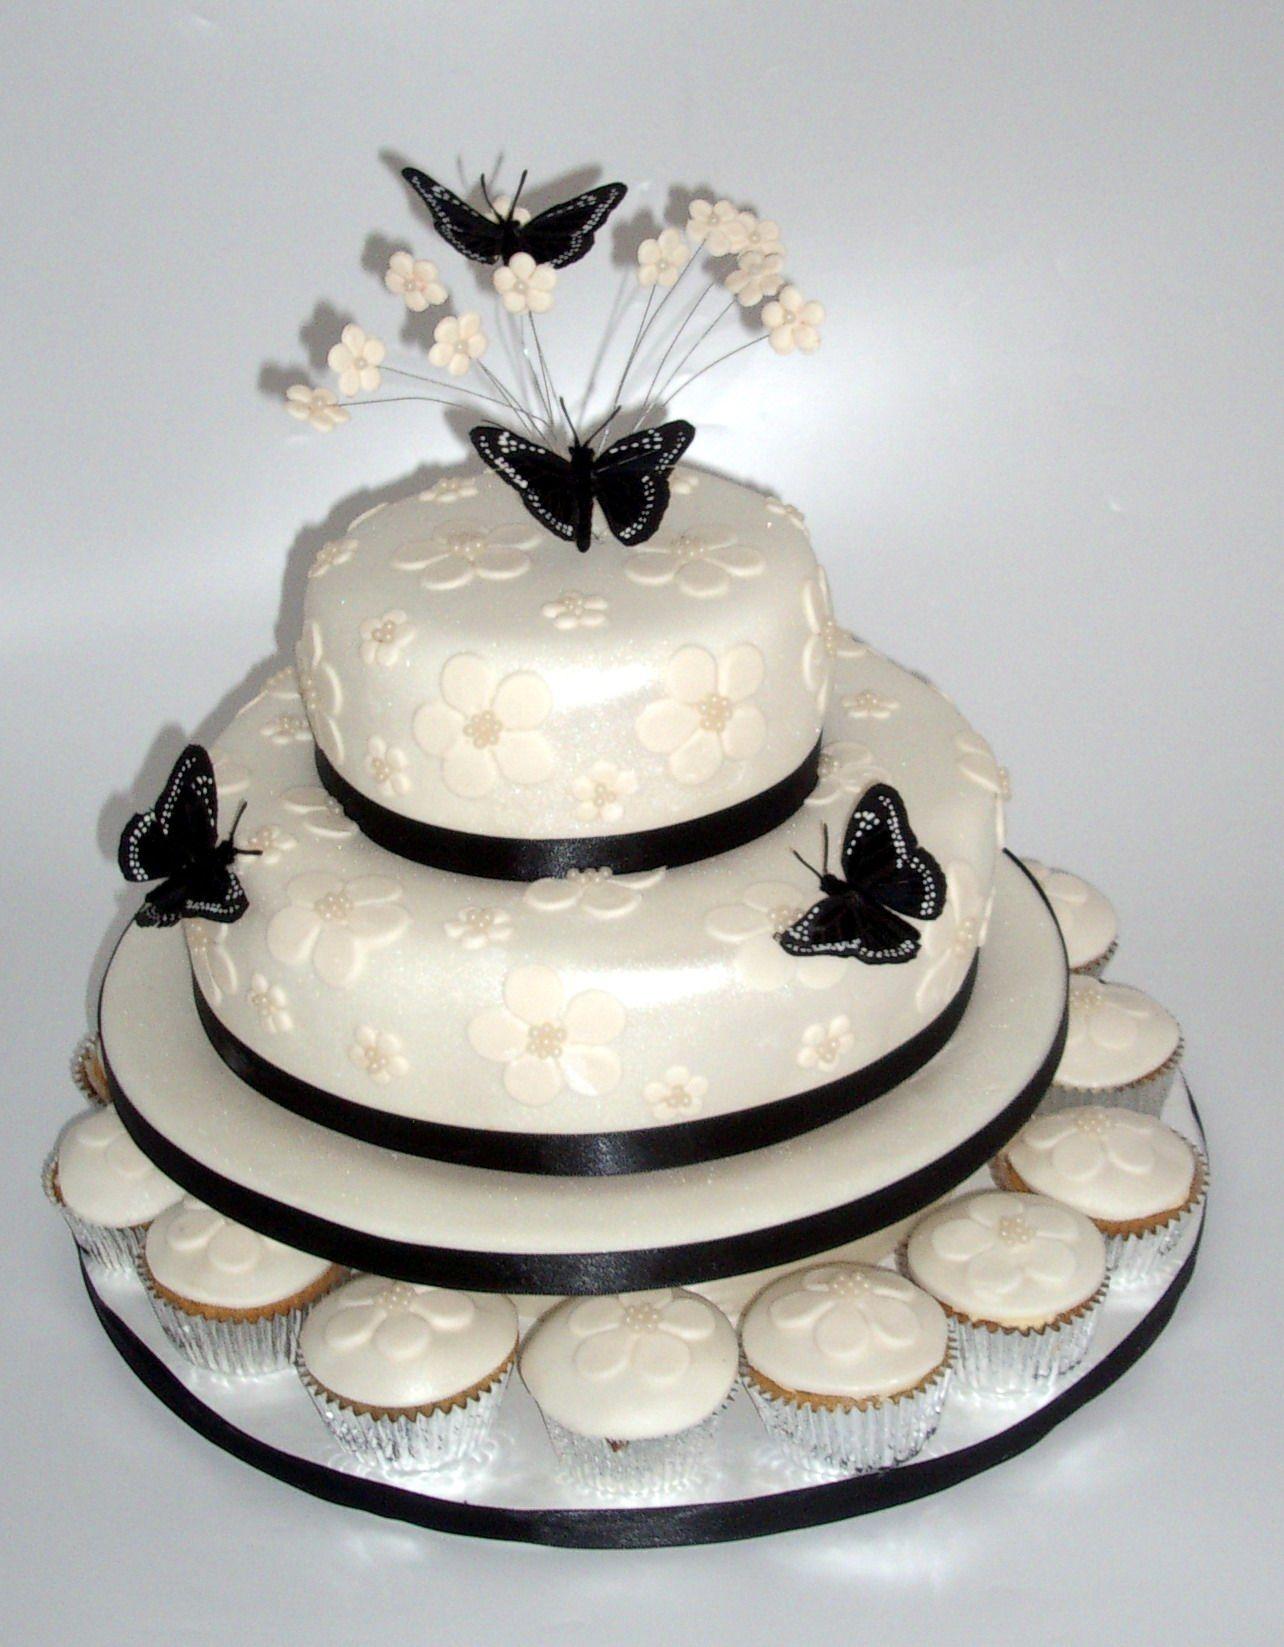 Flowers u butterflies wedding cake make the black into blue the